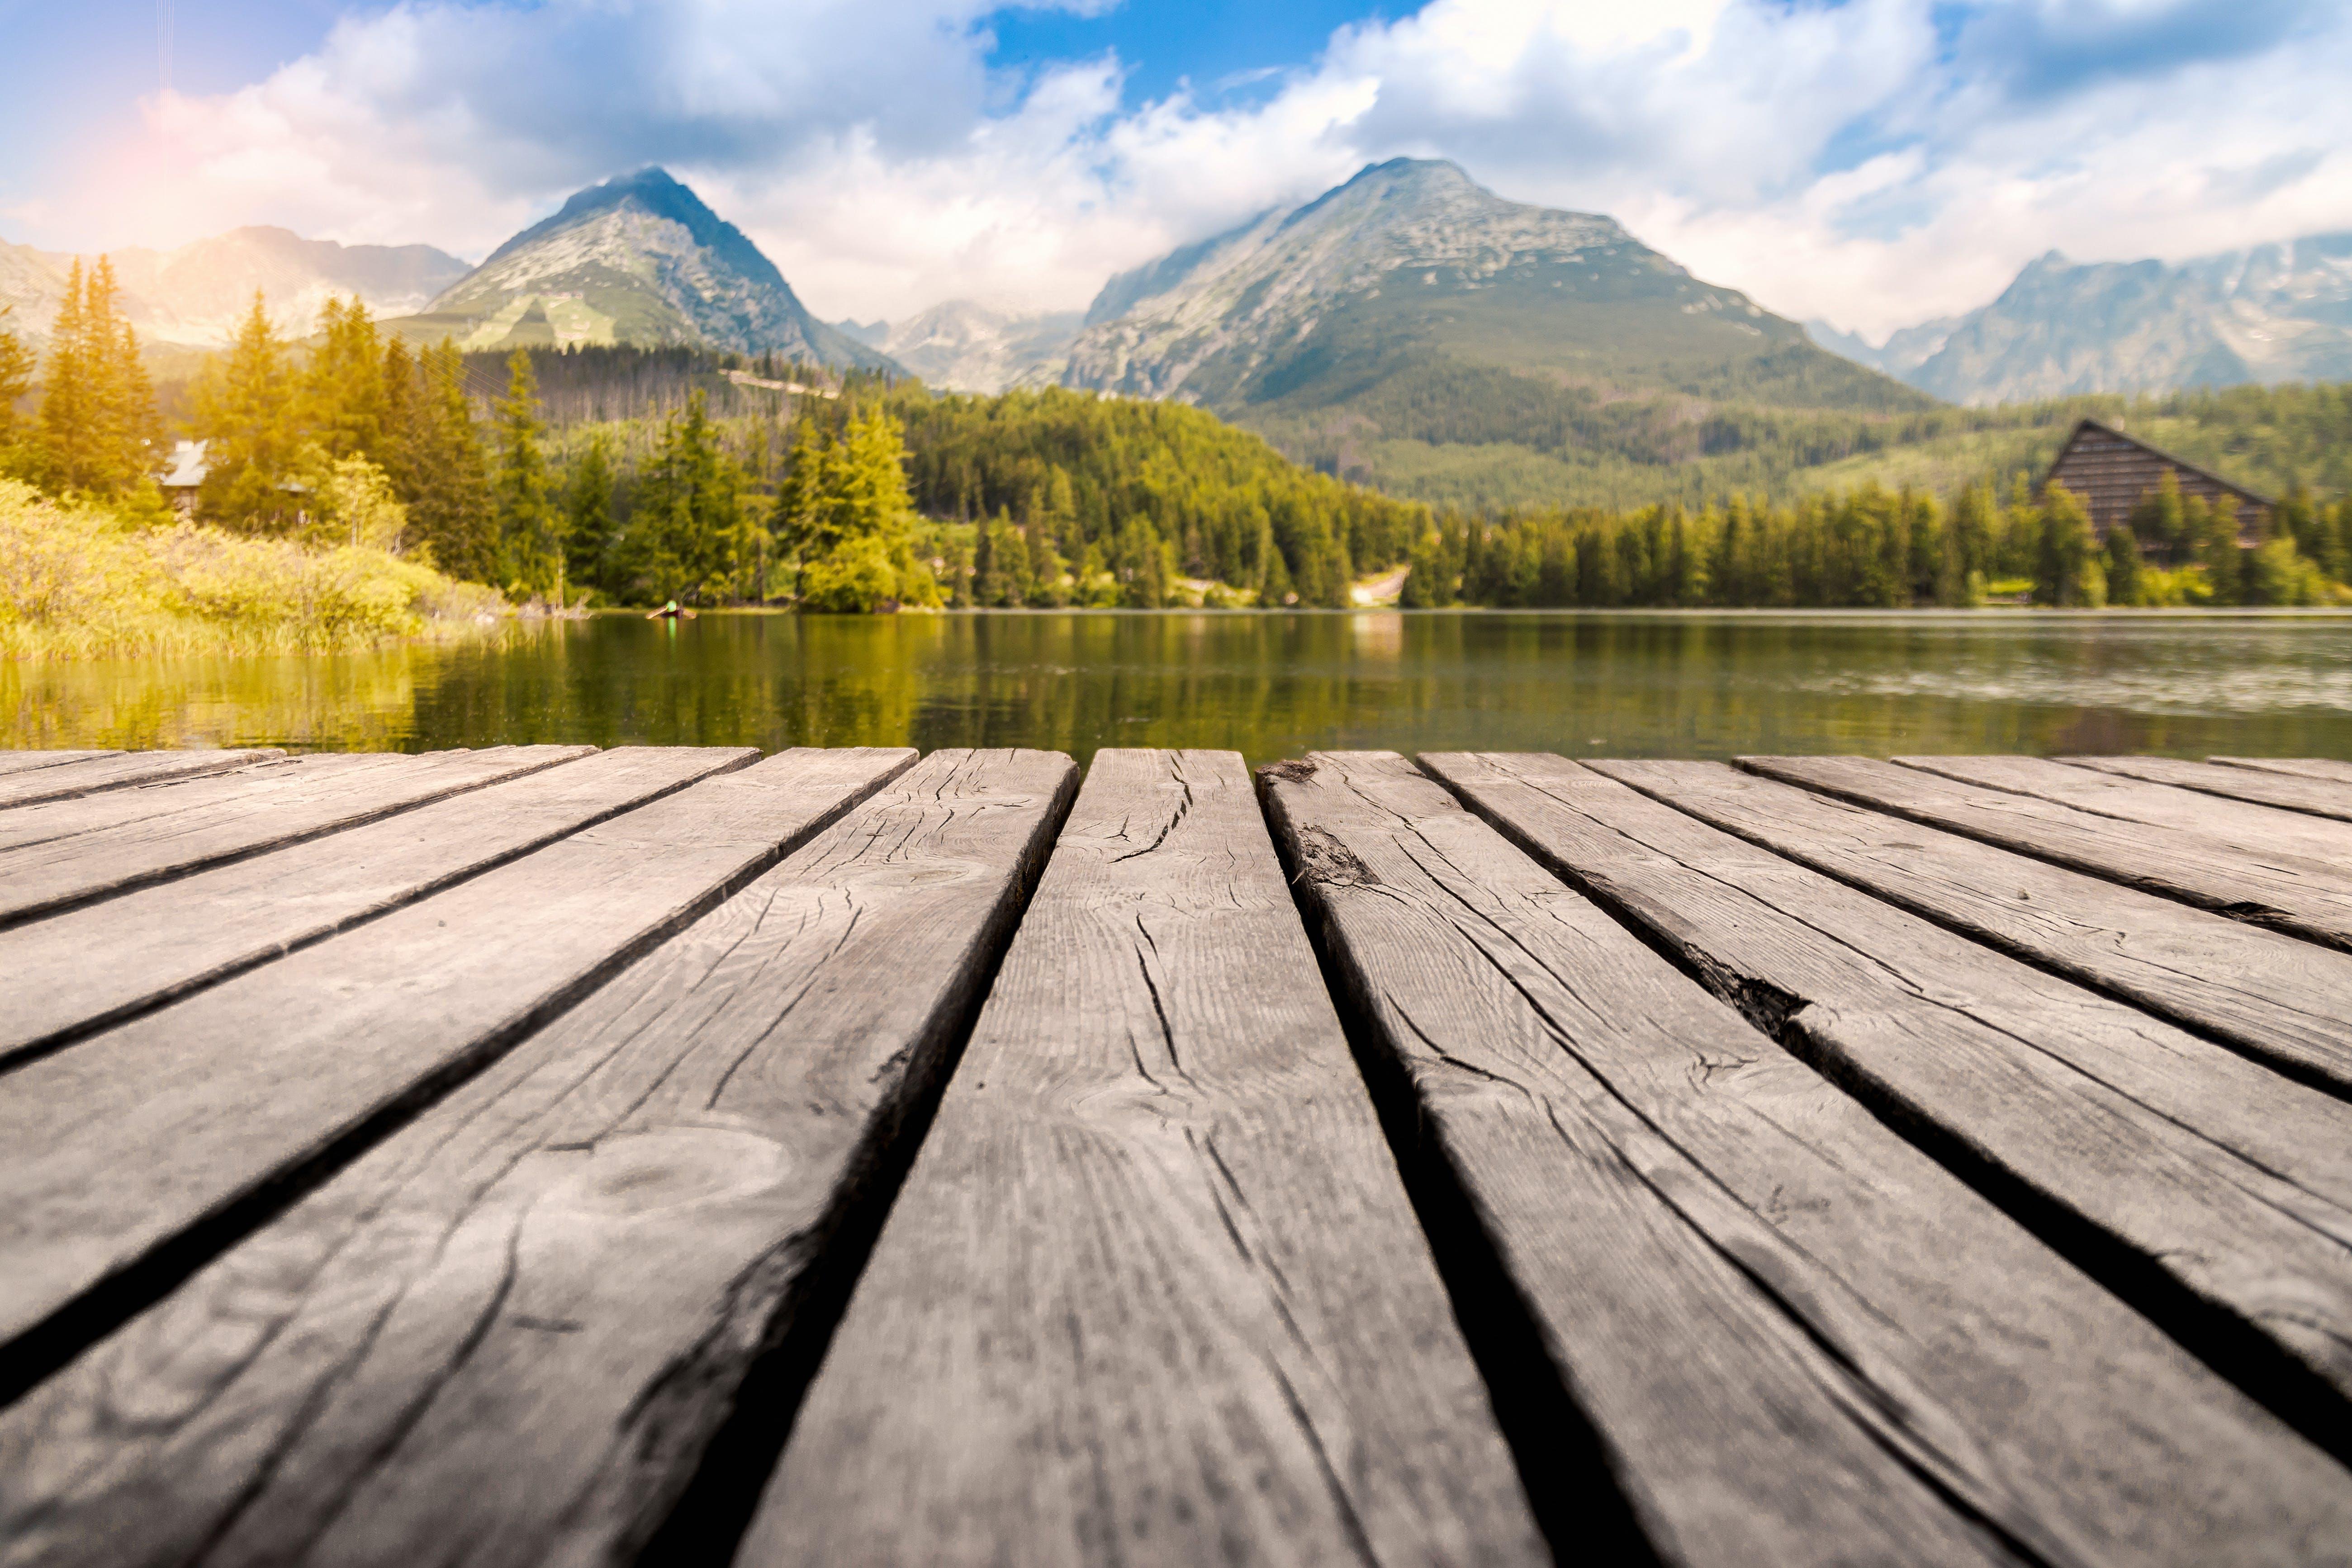 Kostenloses Stock Foto zu bäume, berge, dock, friedlich